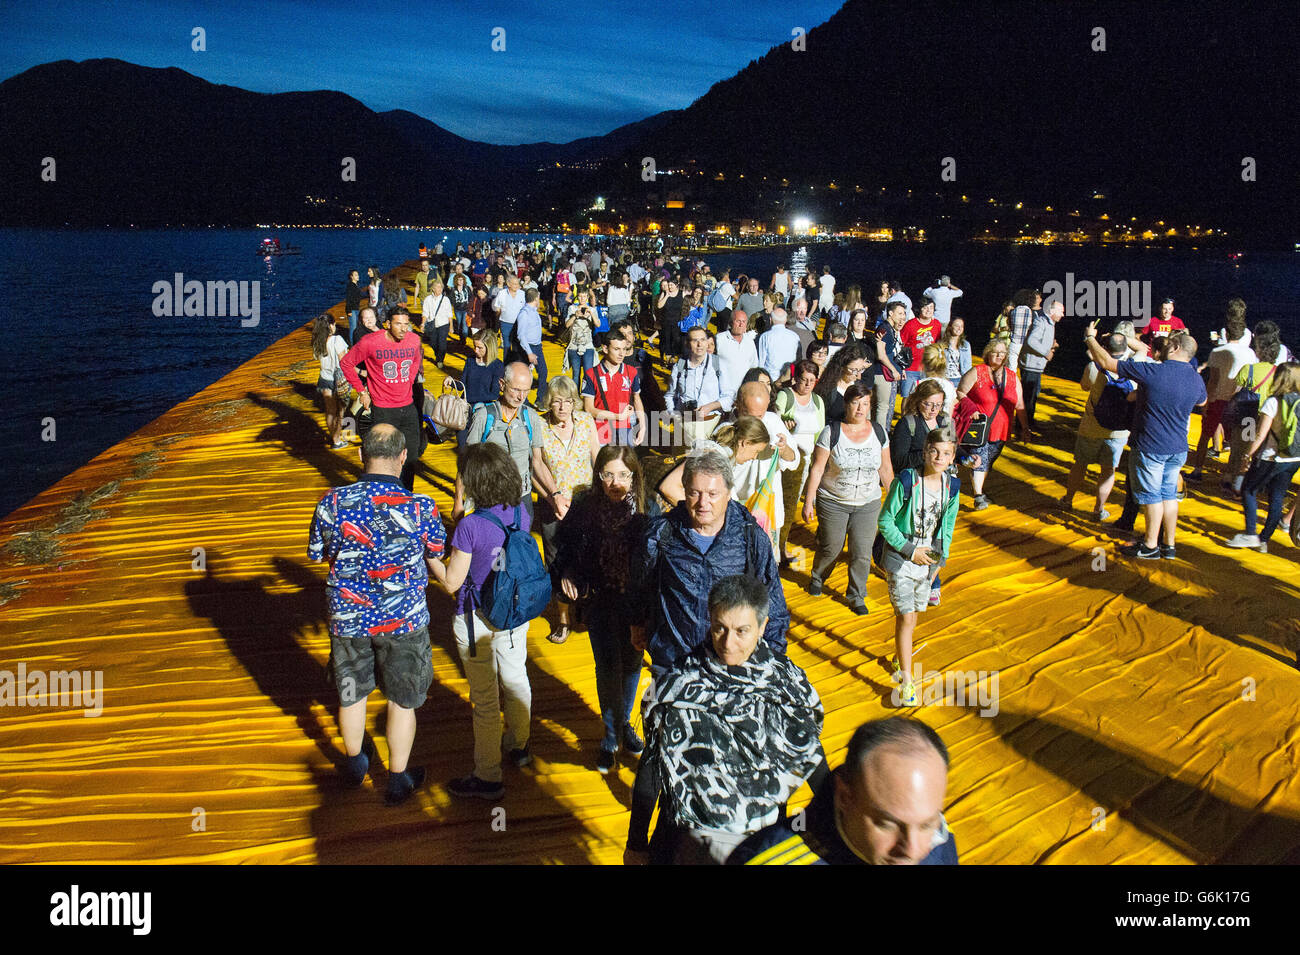 Lake Iseo, Italy. Lombardy Christo Vladimirov Yavachev realized The Floating Piers linking Sulzano with Montisola - Stock Image